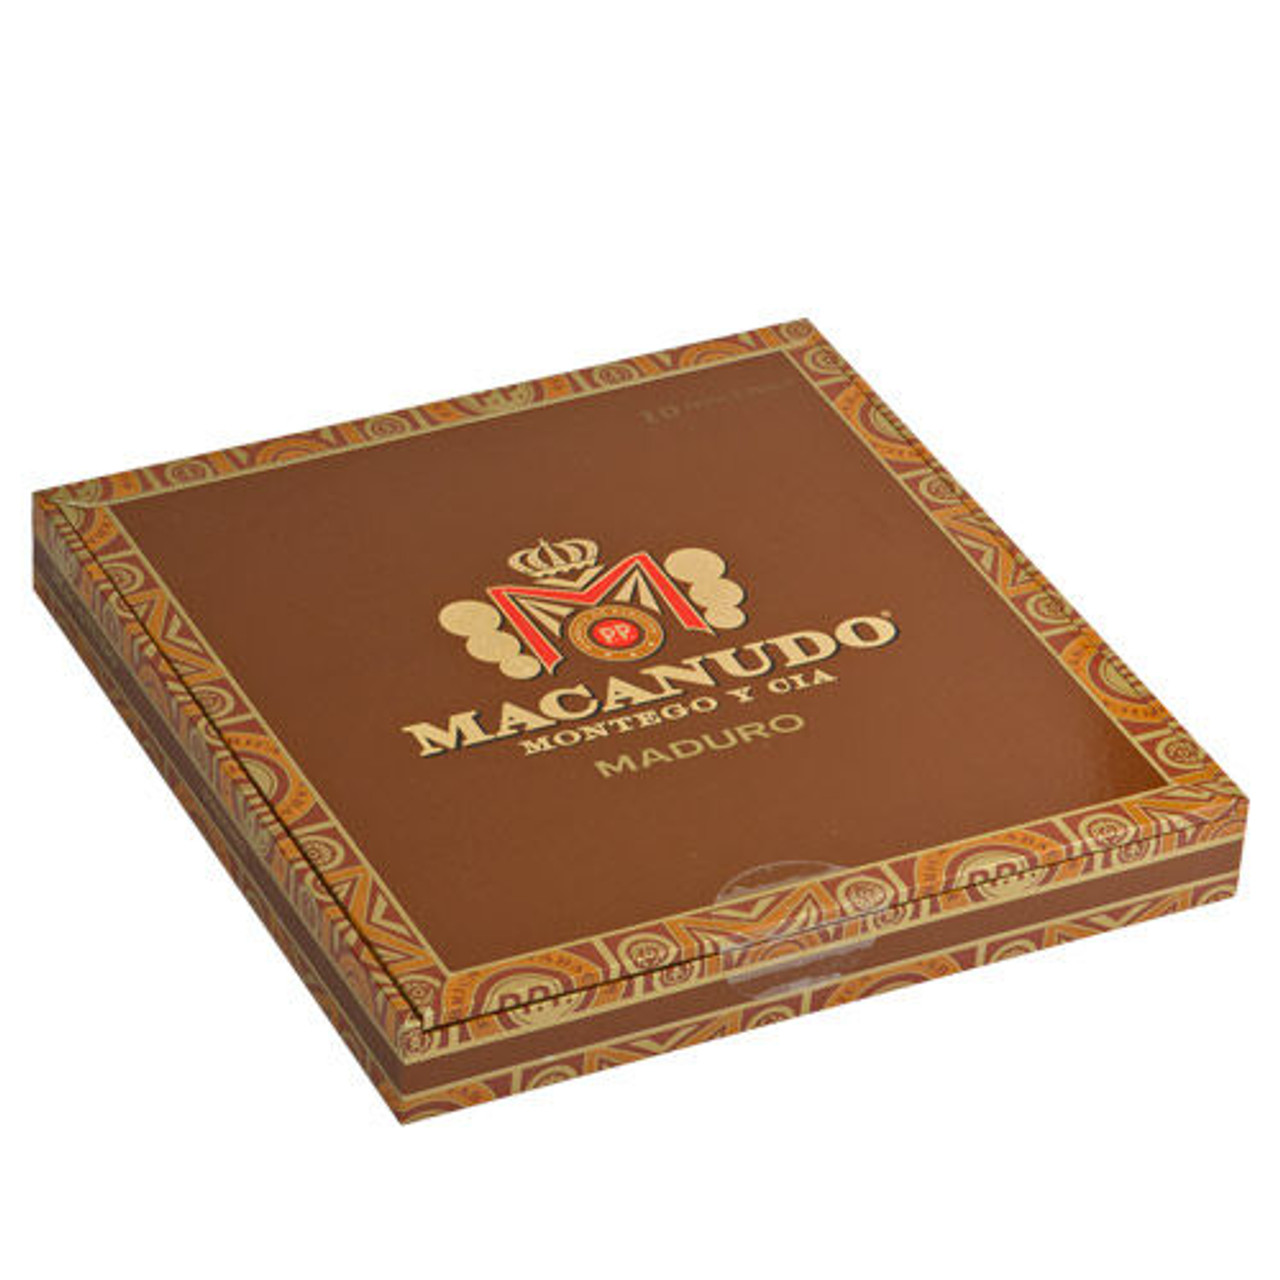 Macanudo Prince Philip Maduro Cigars - 7 x 49 (Box of 10)